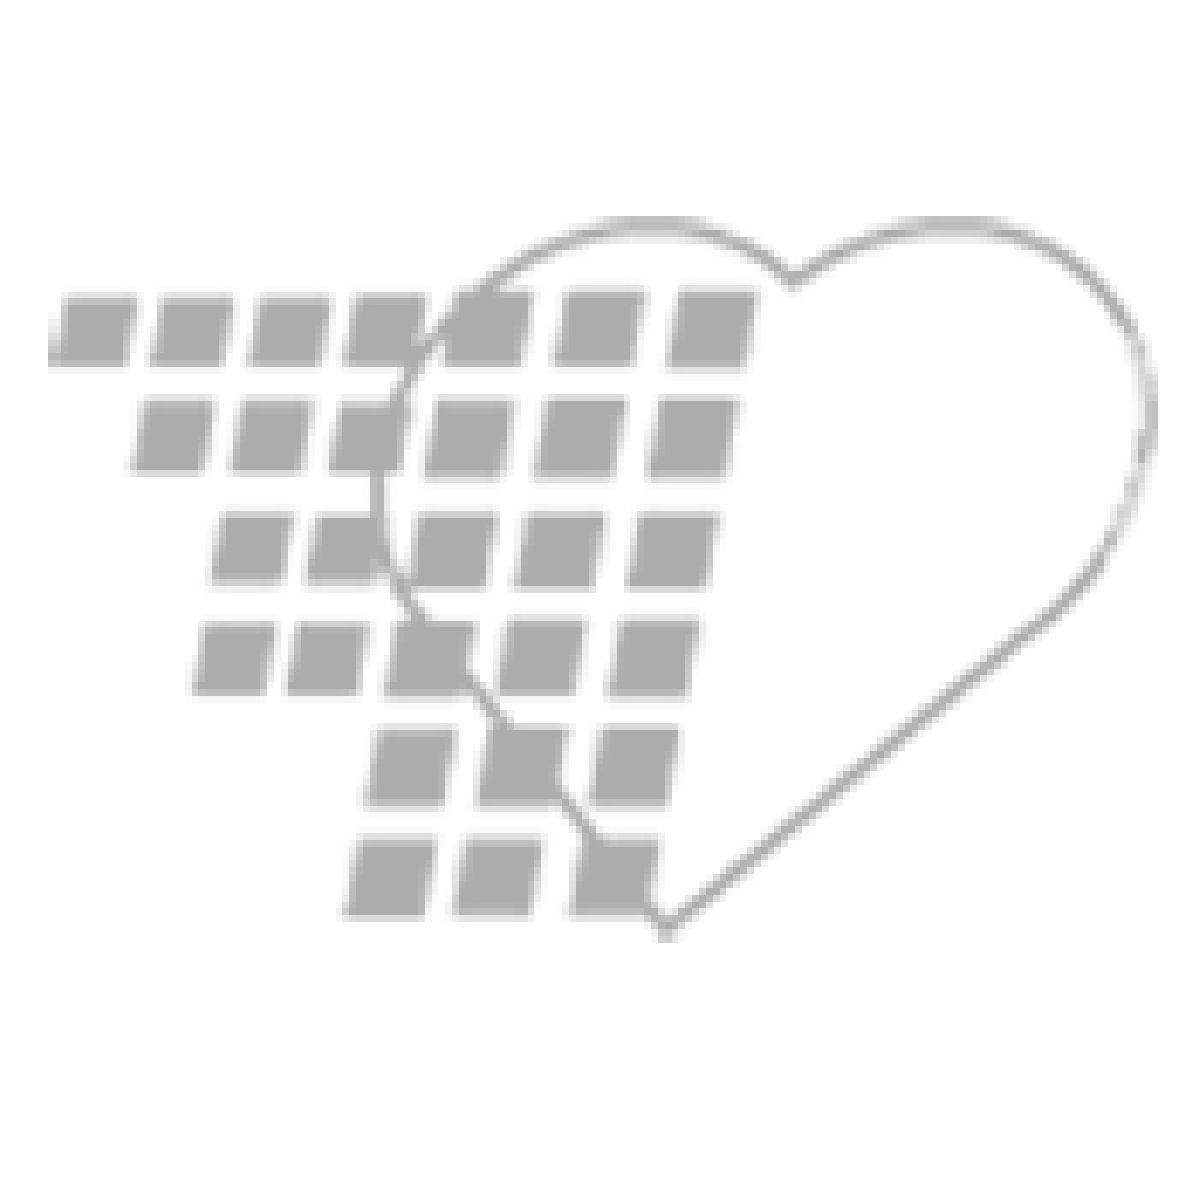 03-47-2160 Innovative Healthcare Corporation NitriDerm® Powder-Free Nitrile Surgical Gloves